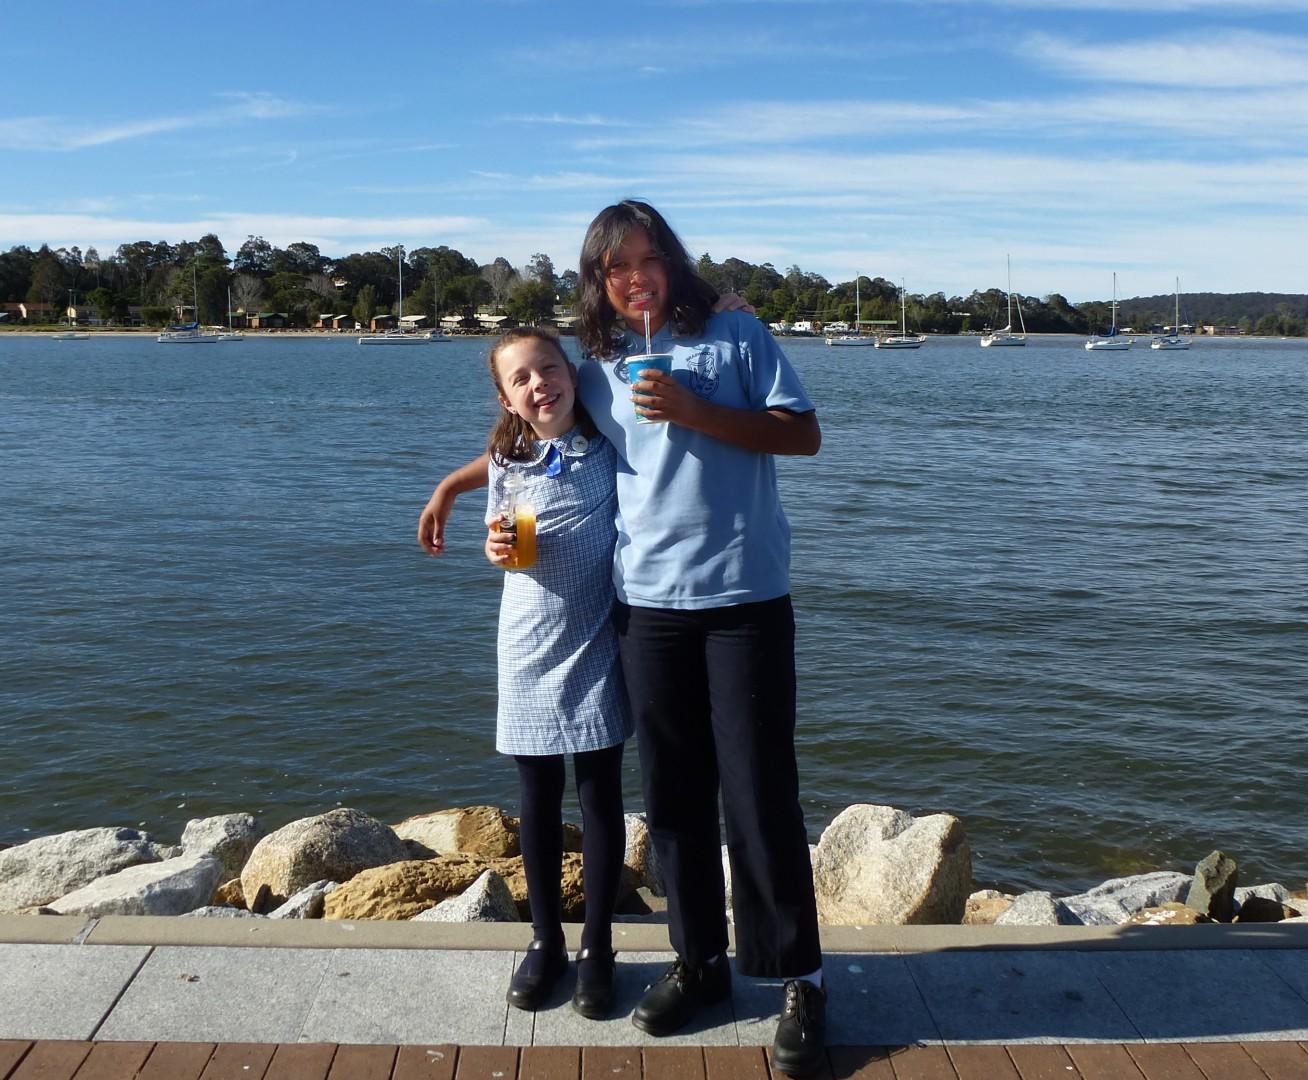 Bonnie and Jallamara at the Batemans Bay Public Speaking Event.